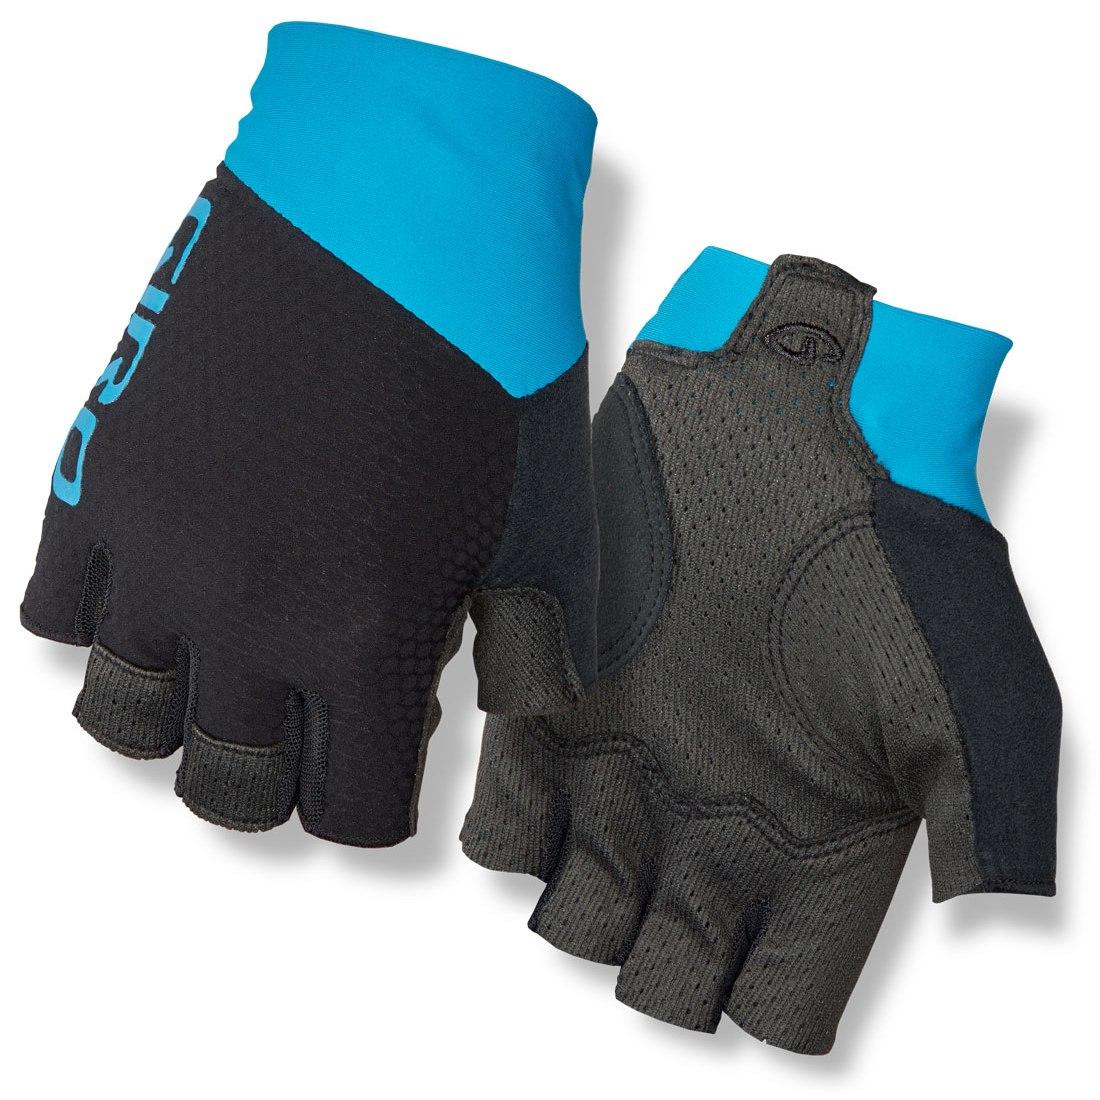 Image of Giro Zero CS Gloves - blue jewel/black